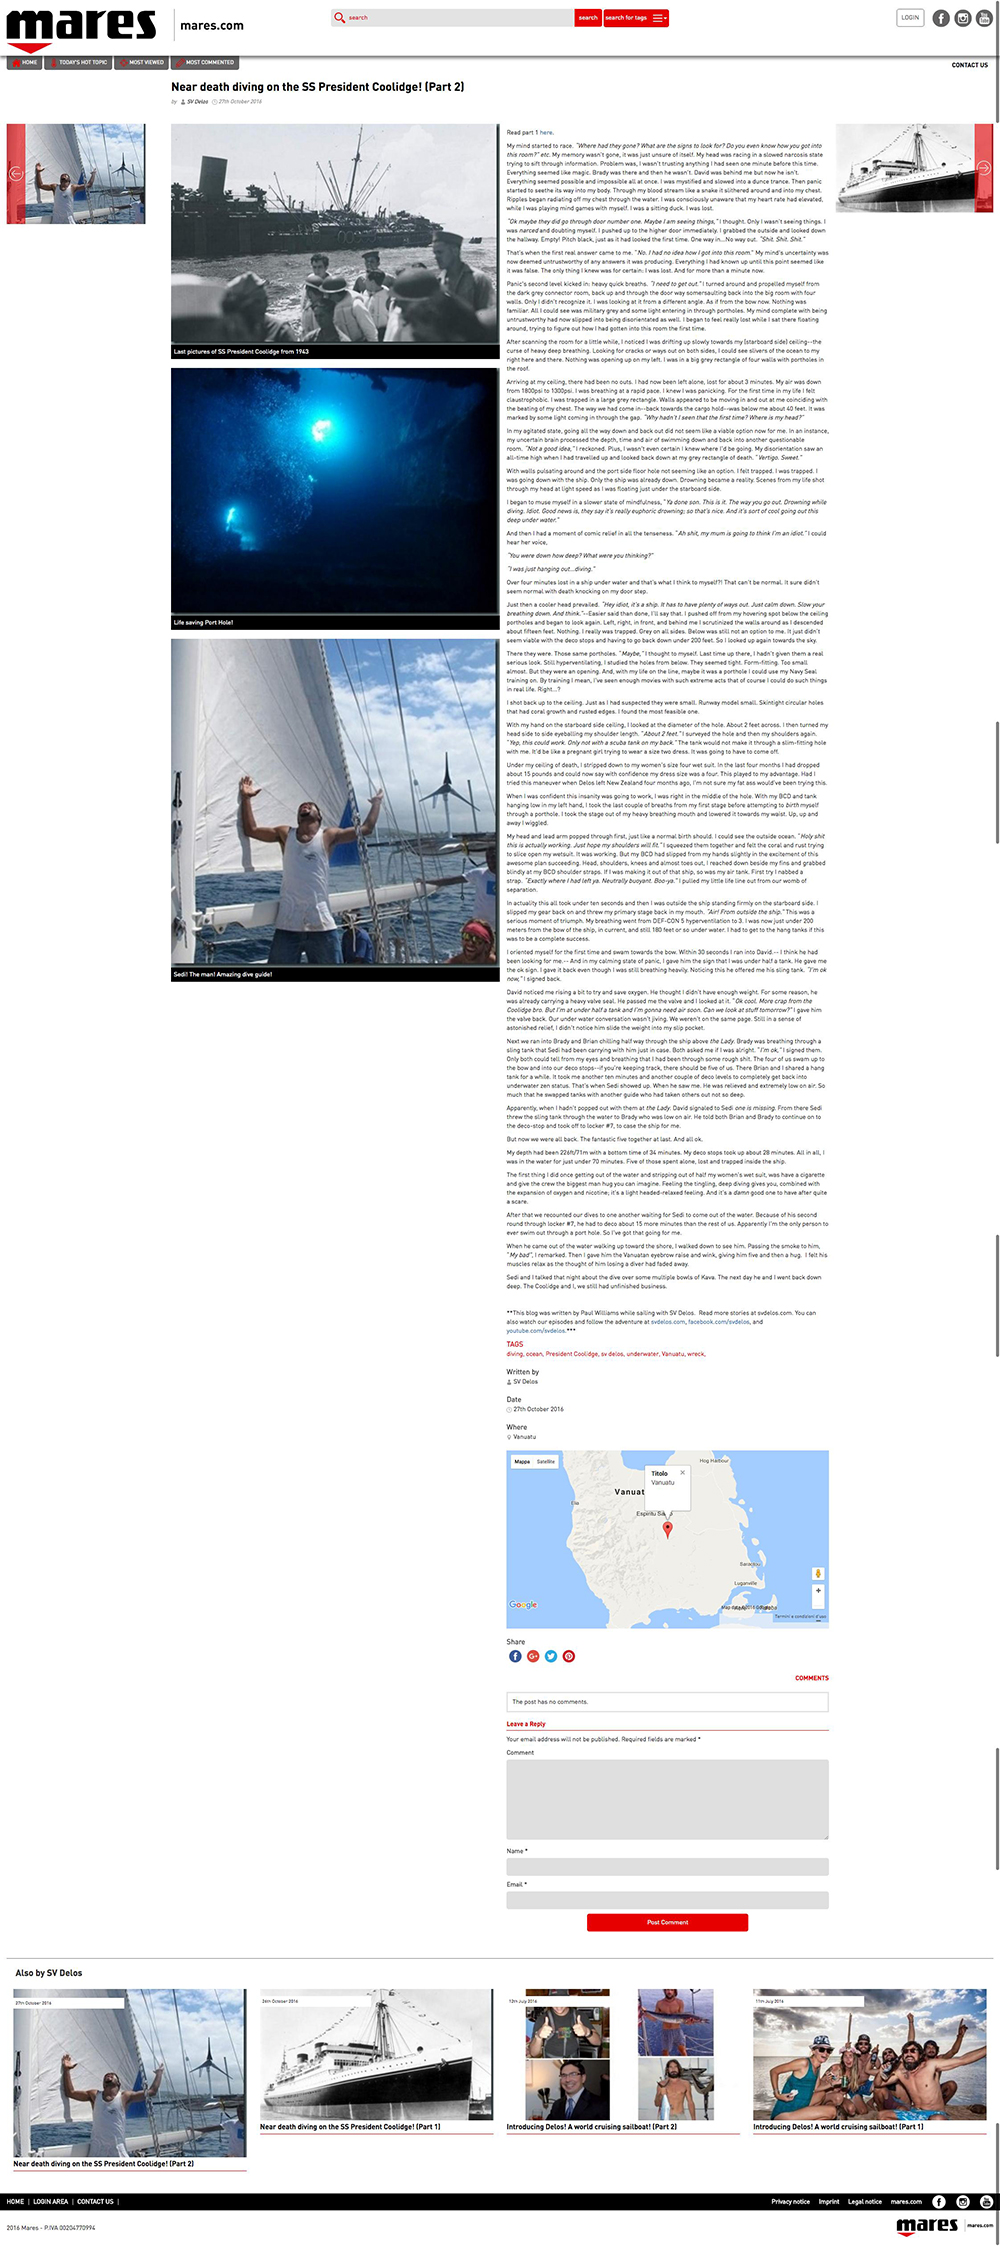 mares-blog-2